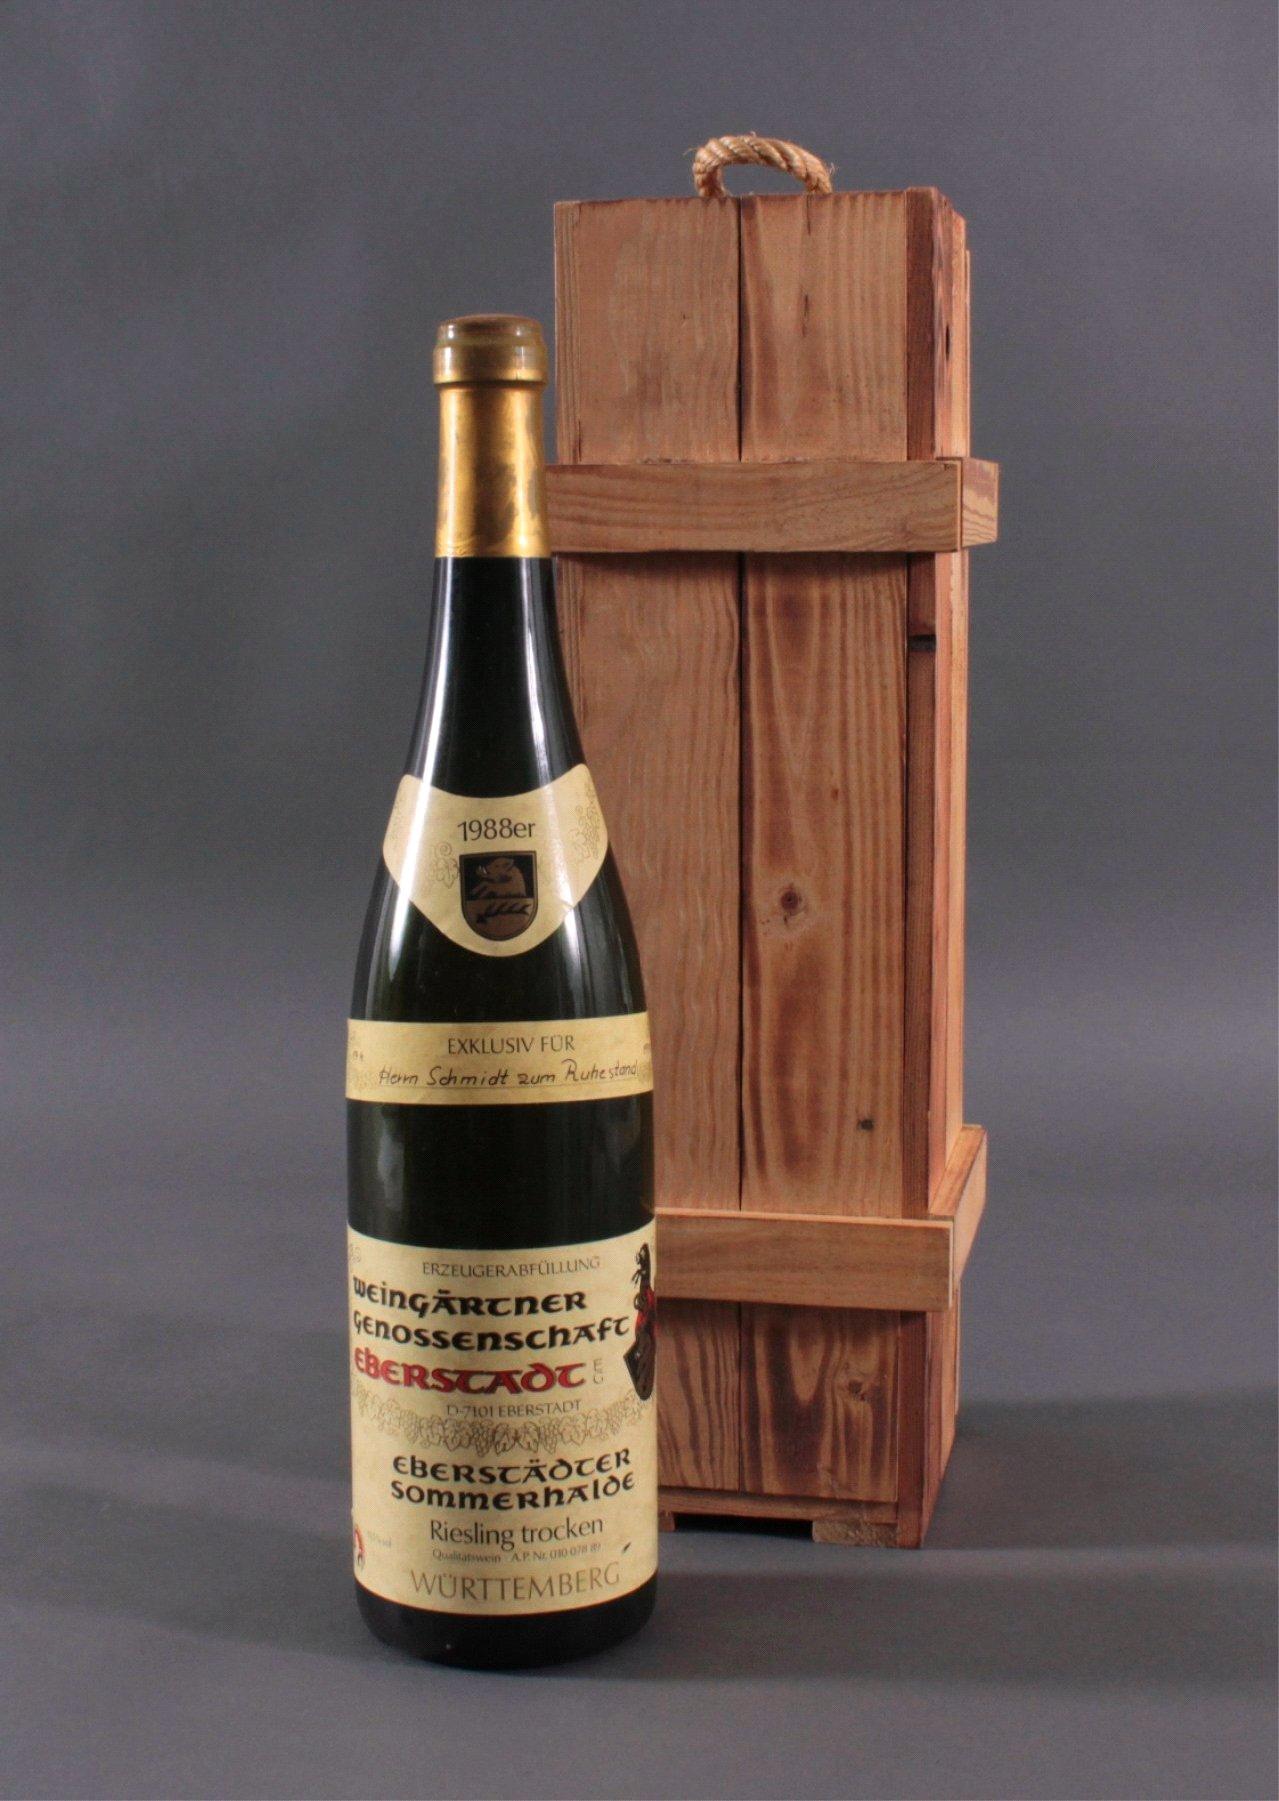 1988er Eberstädter Sommerhalde, Magnum Flasche